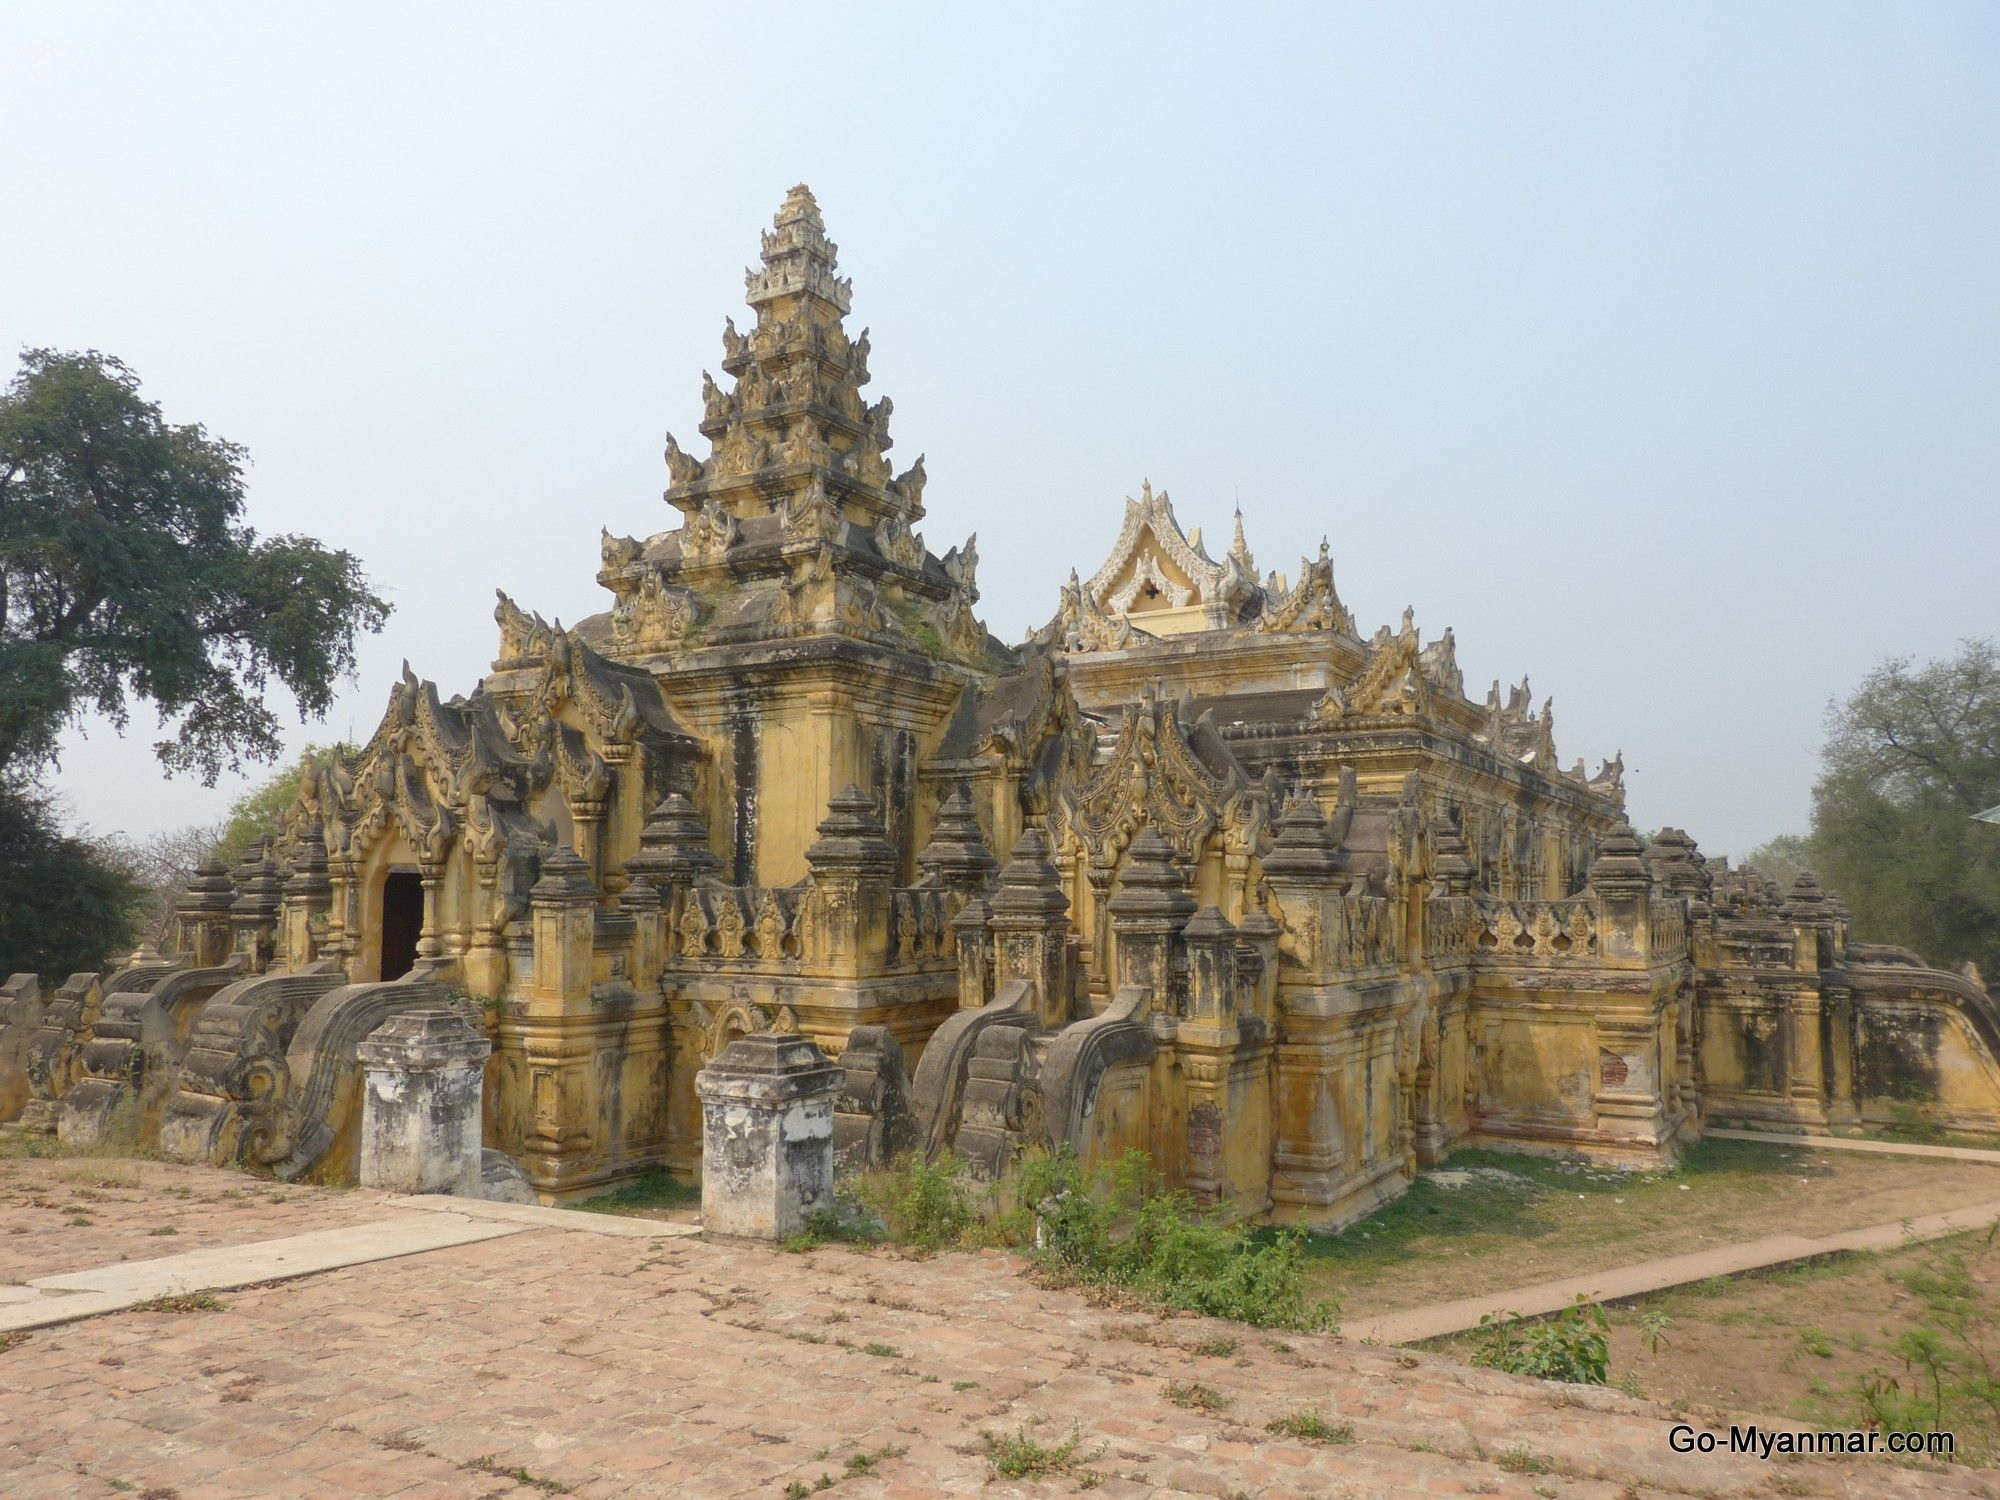 Maha aungmye bonzan monastery inwa ava myanmar burma go maha aungmye bonzan monastery inwa ava myanmar burma go thecheapjerseys Images